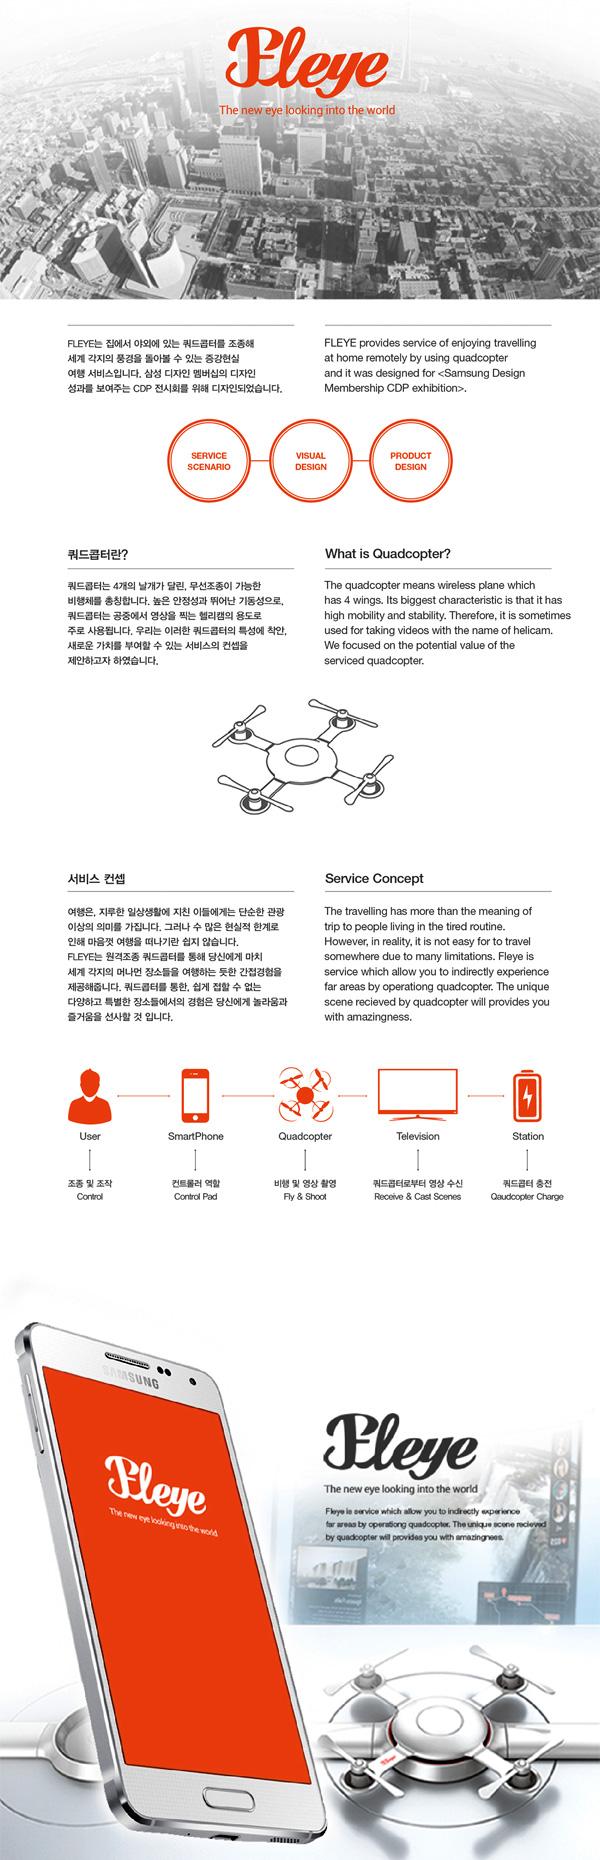 FLEYE Quadcopter by Kim Joongu, Choi Kyusung, Seo Won-kyoung, Kim Yeojin, Kwon Jina, Mun Heeseung and Park